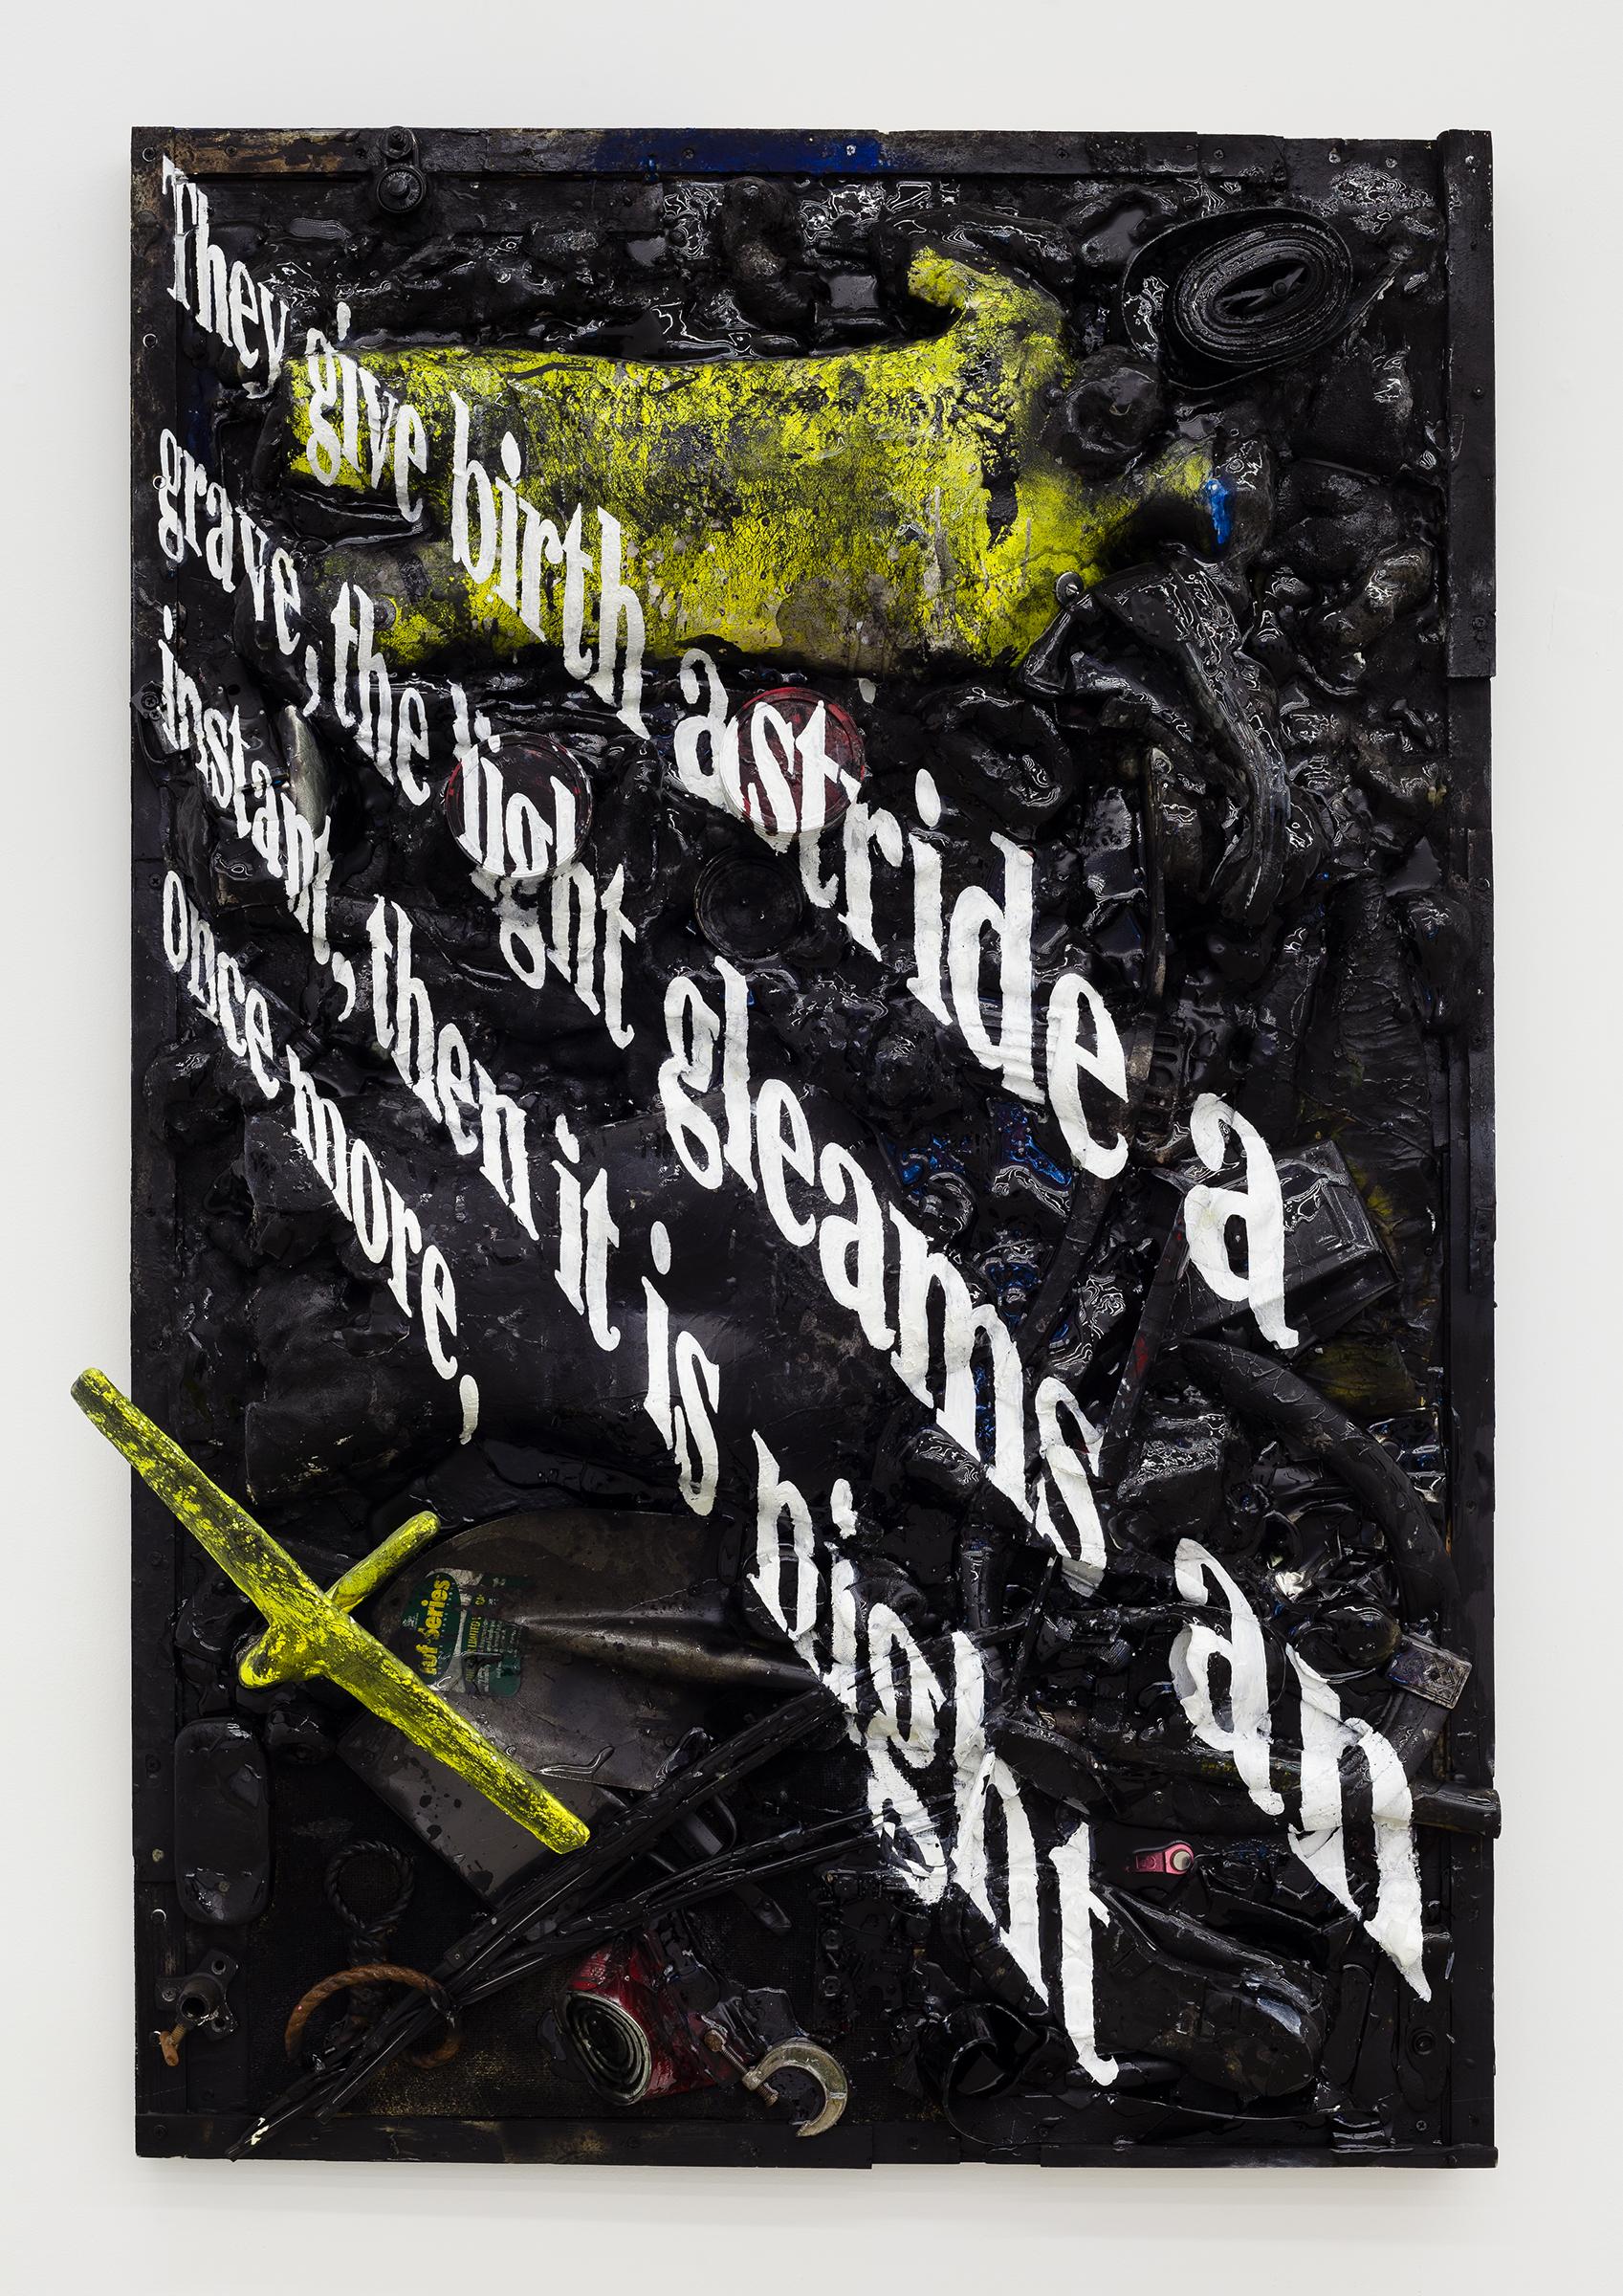 Justin Lieberman, Granular Knowledge, 2014, mixed media,60 x 40 in.